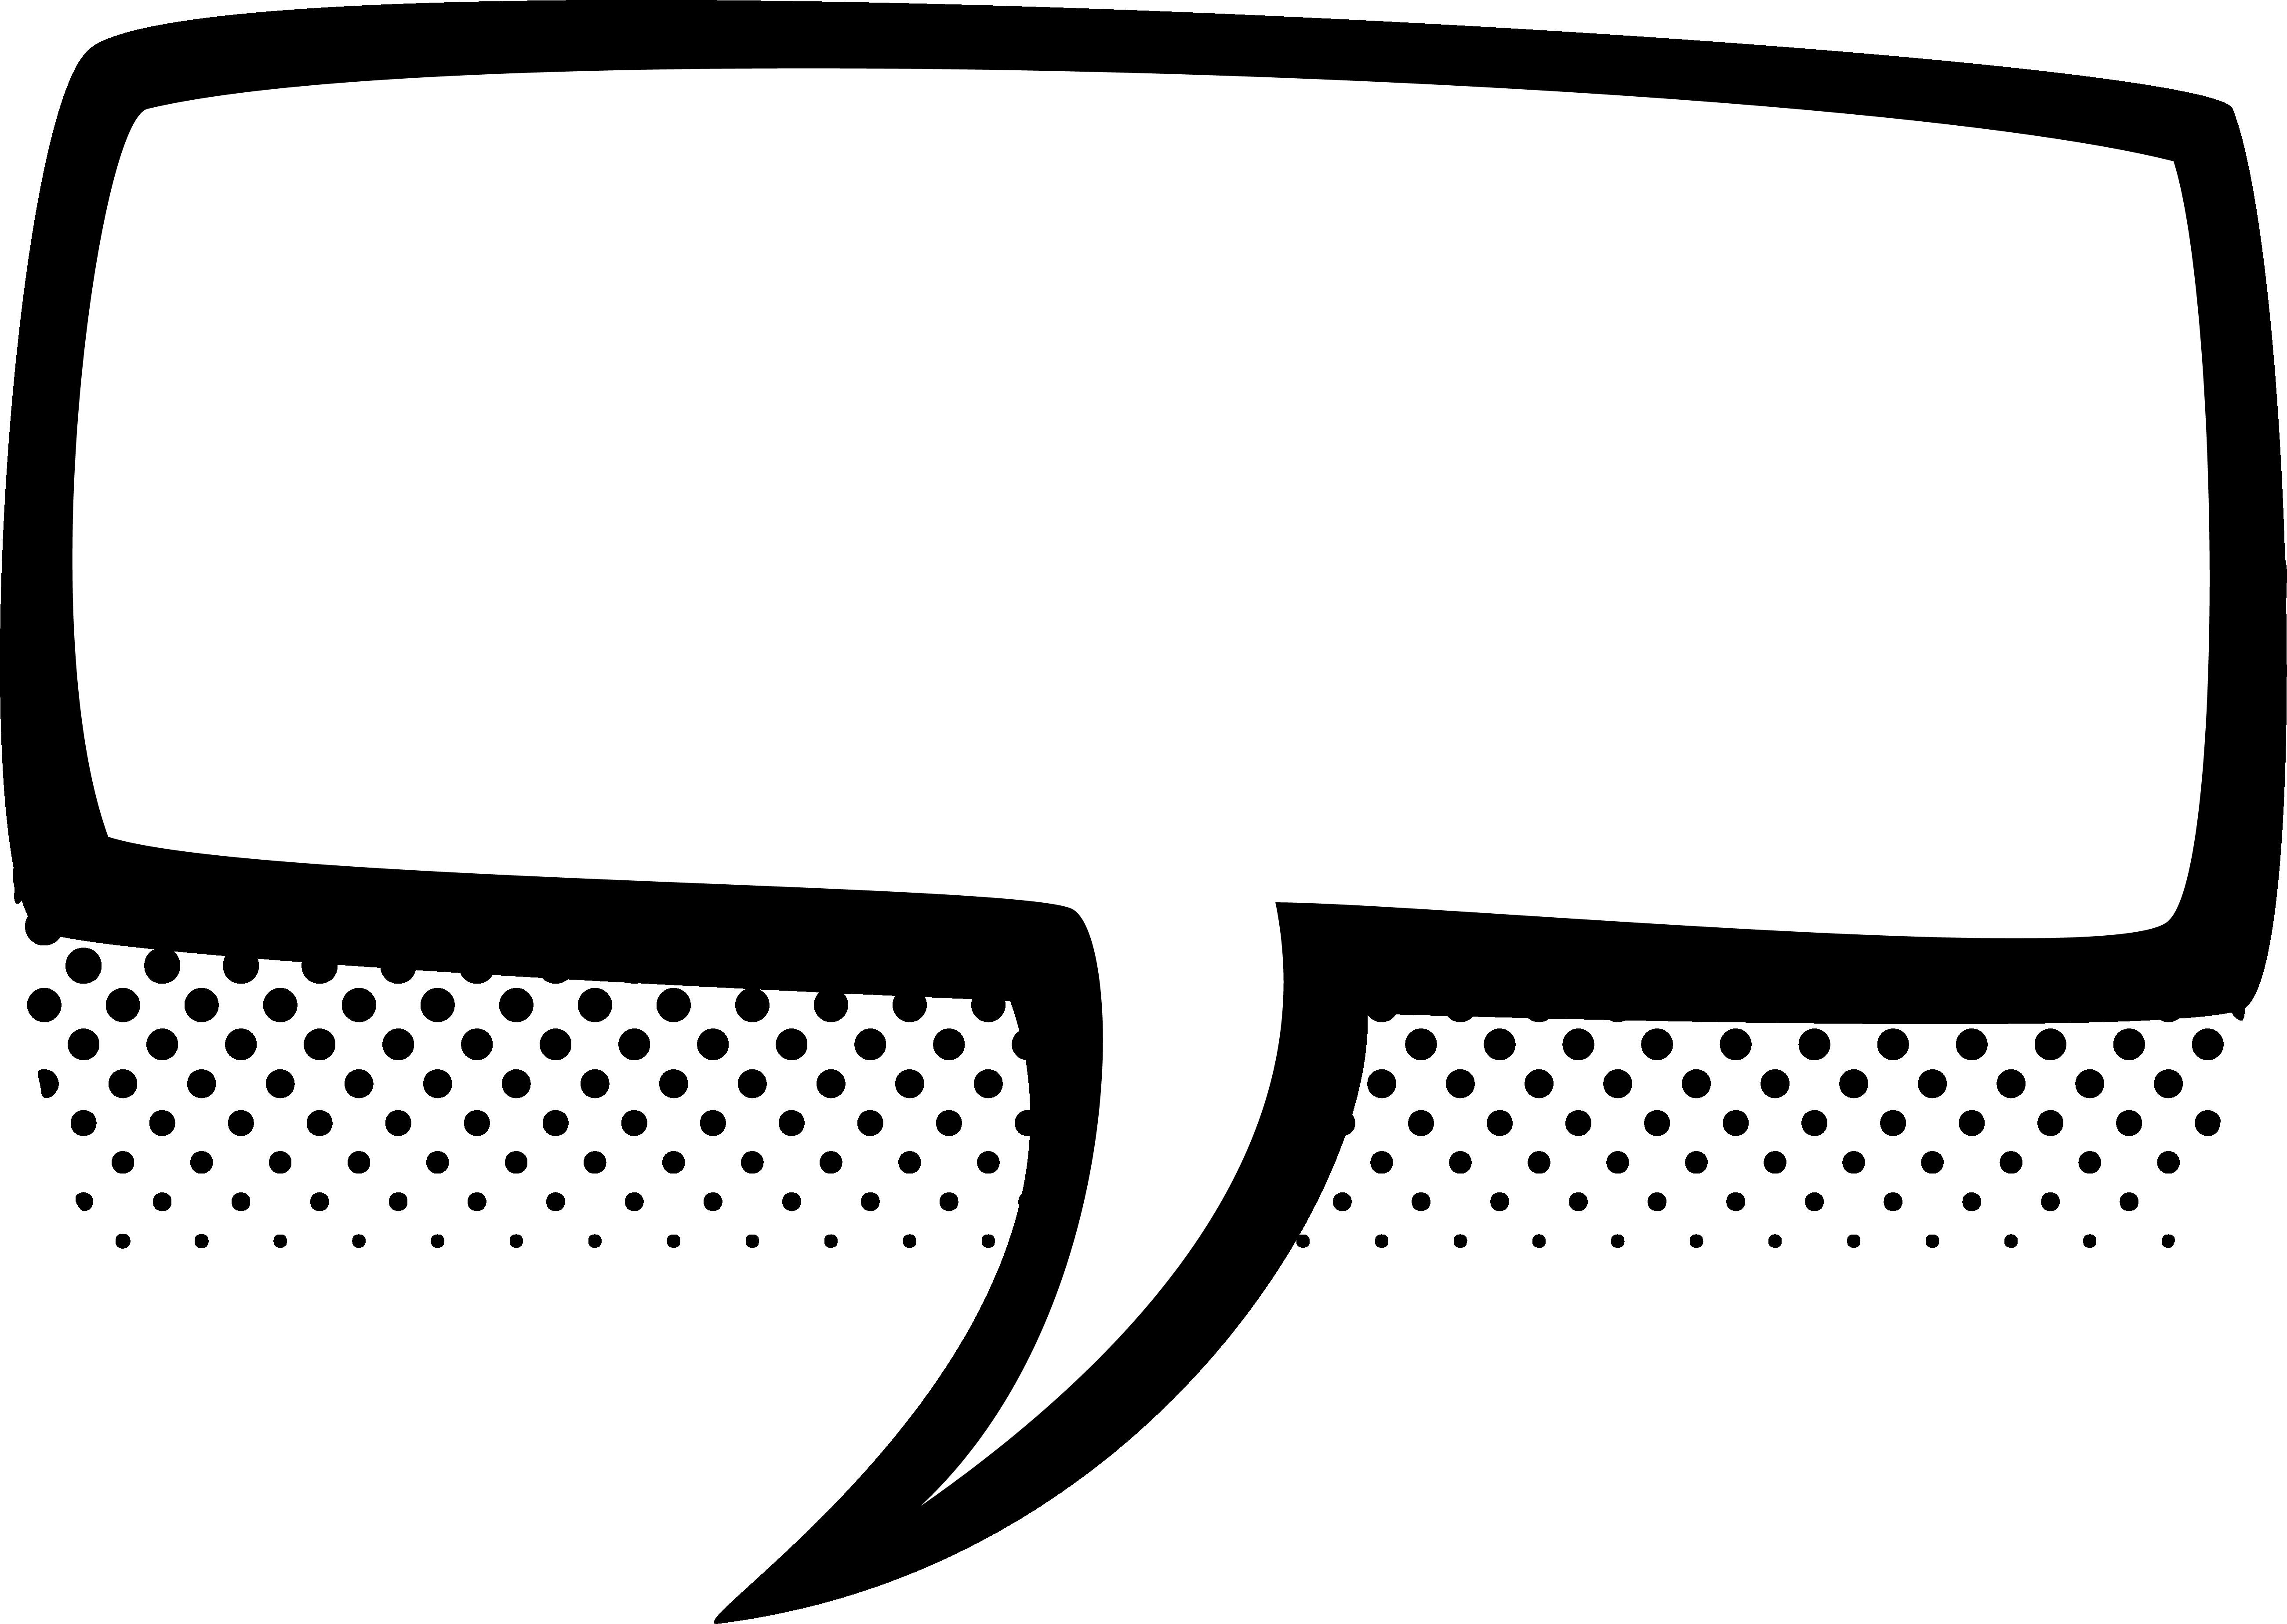 Black Box Empty Comic Bubbles Rain Clipart Png Image Download.